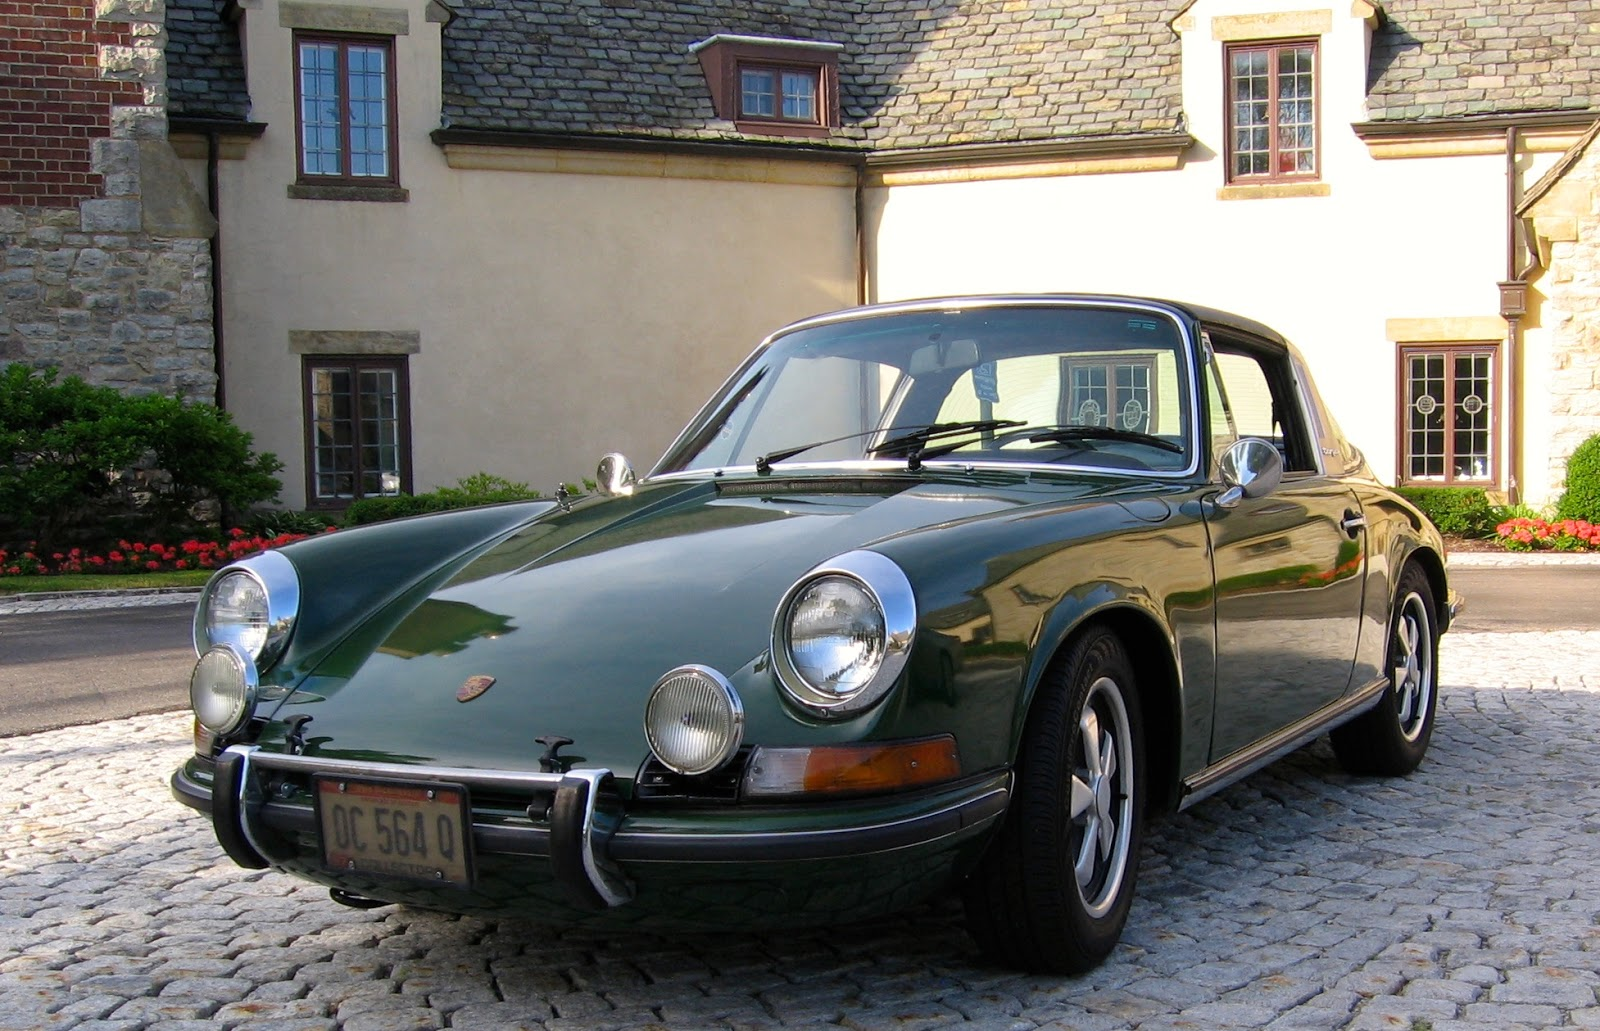 Pic as well Porsche Turbo S E C Porsche Turbo S Fcd Dsc X together with Generalsuspensionprep further L L Bekvr I w X X besides Red Carrera X. on 911 porsche clutch adjustment